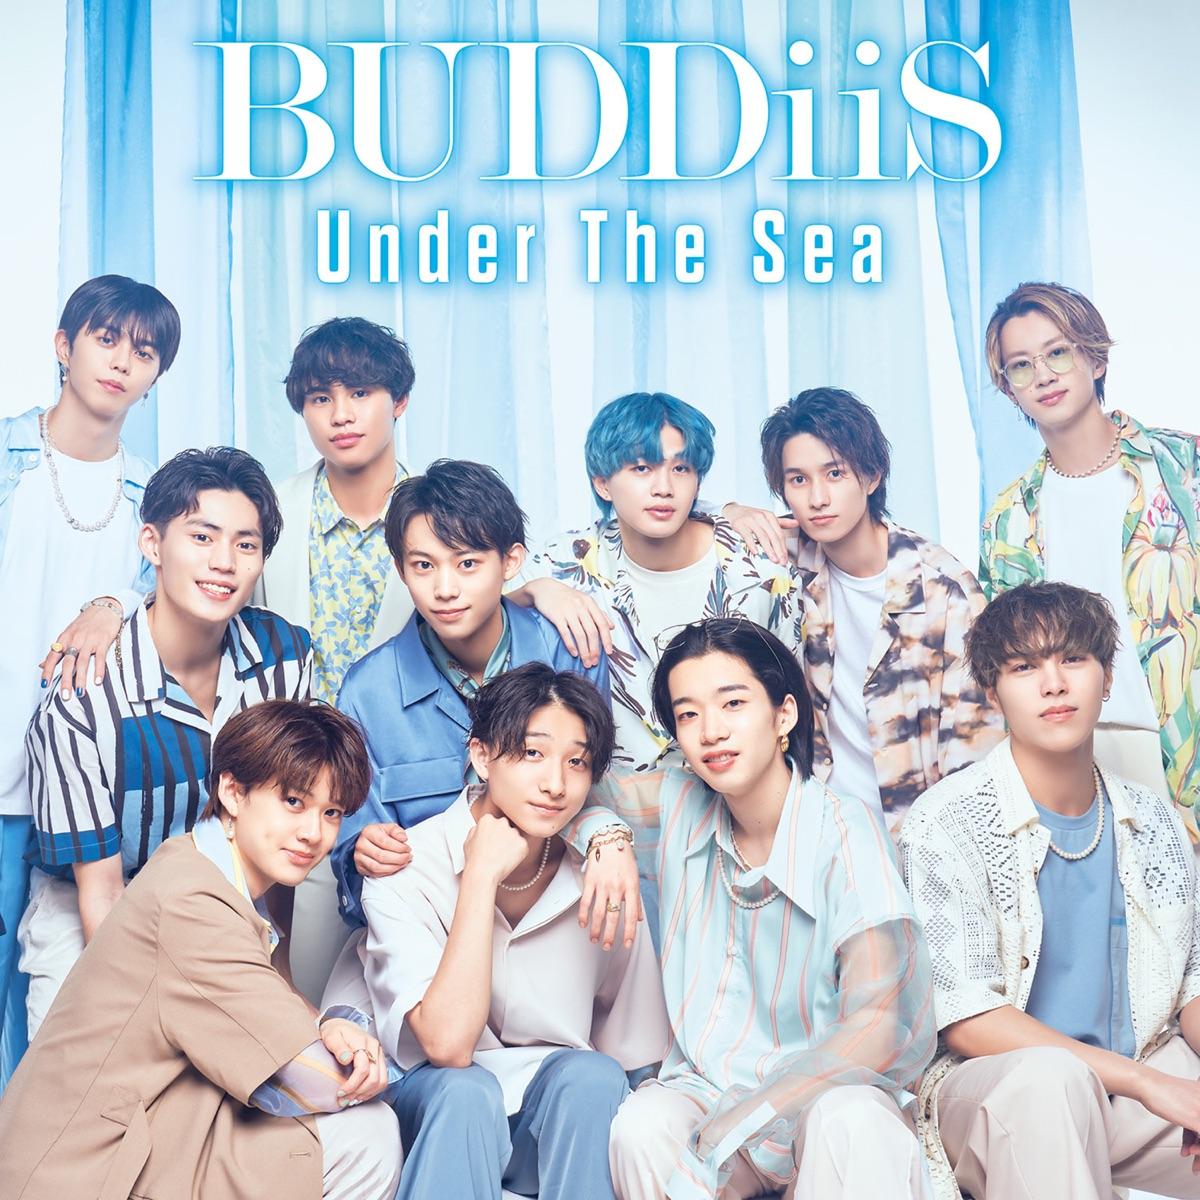 『BUDDiiS - Under The Sea』収録の『Under The Sea』ジャケット